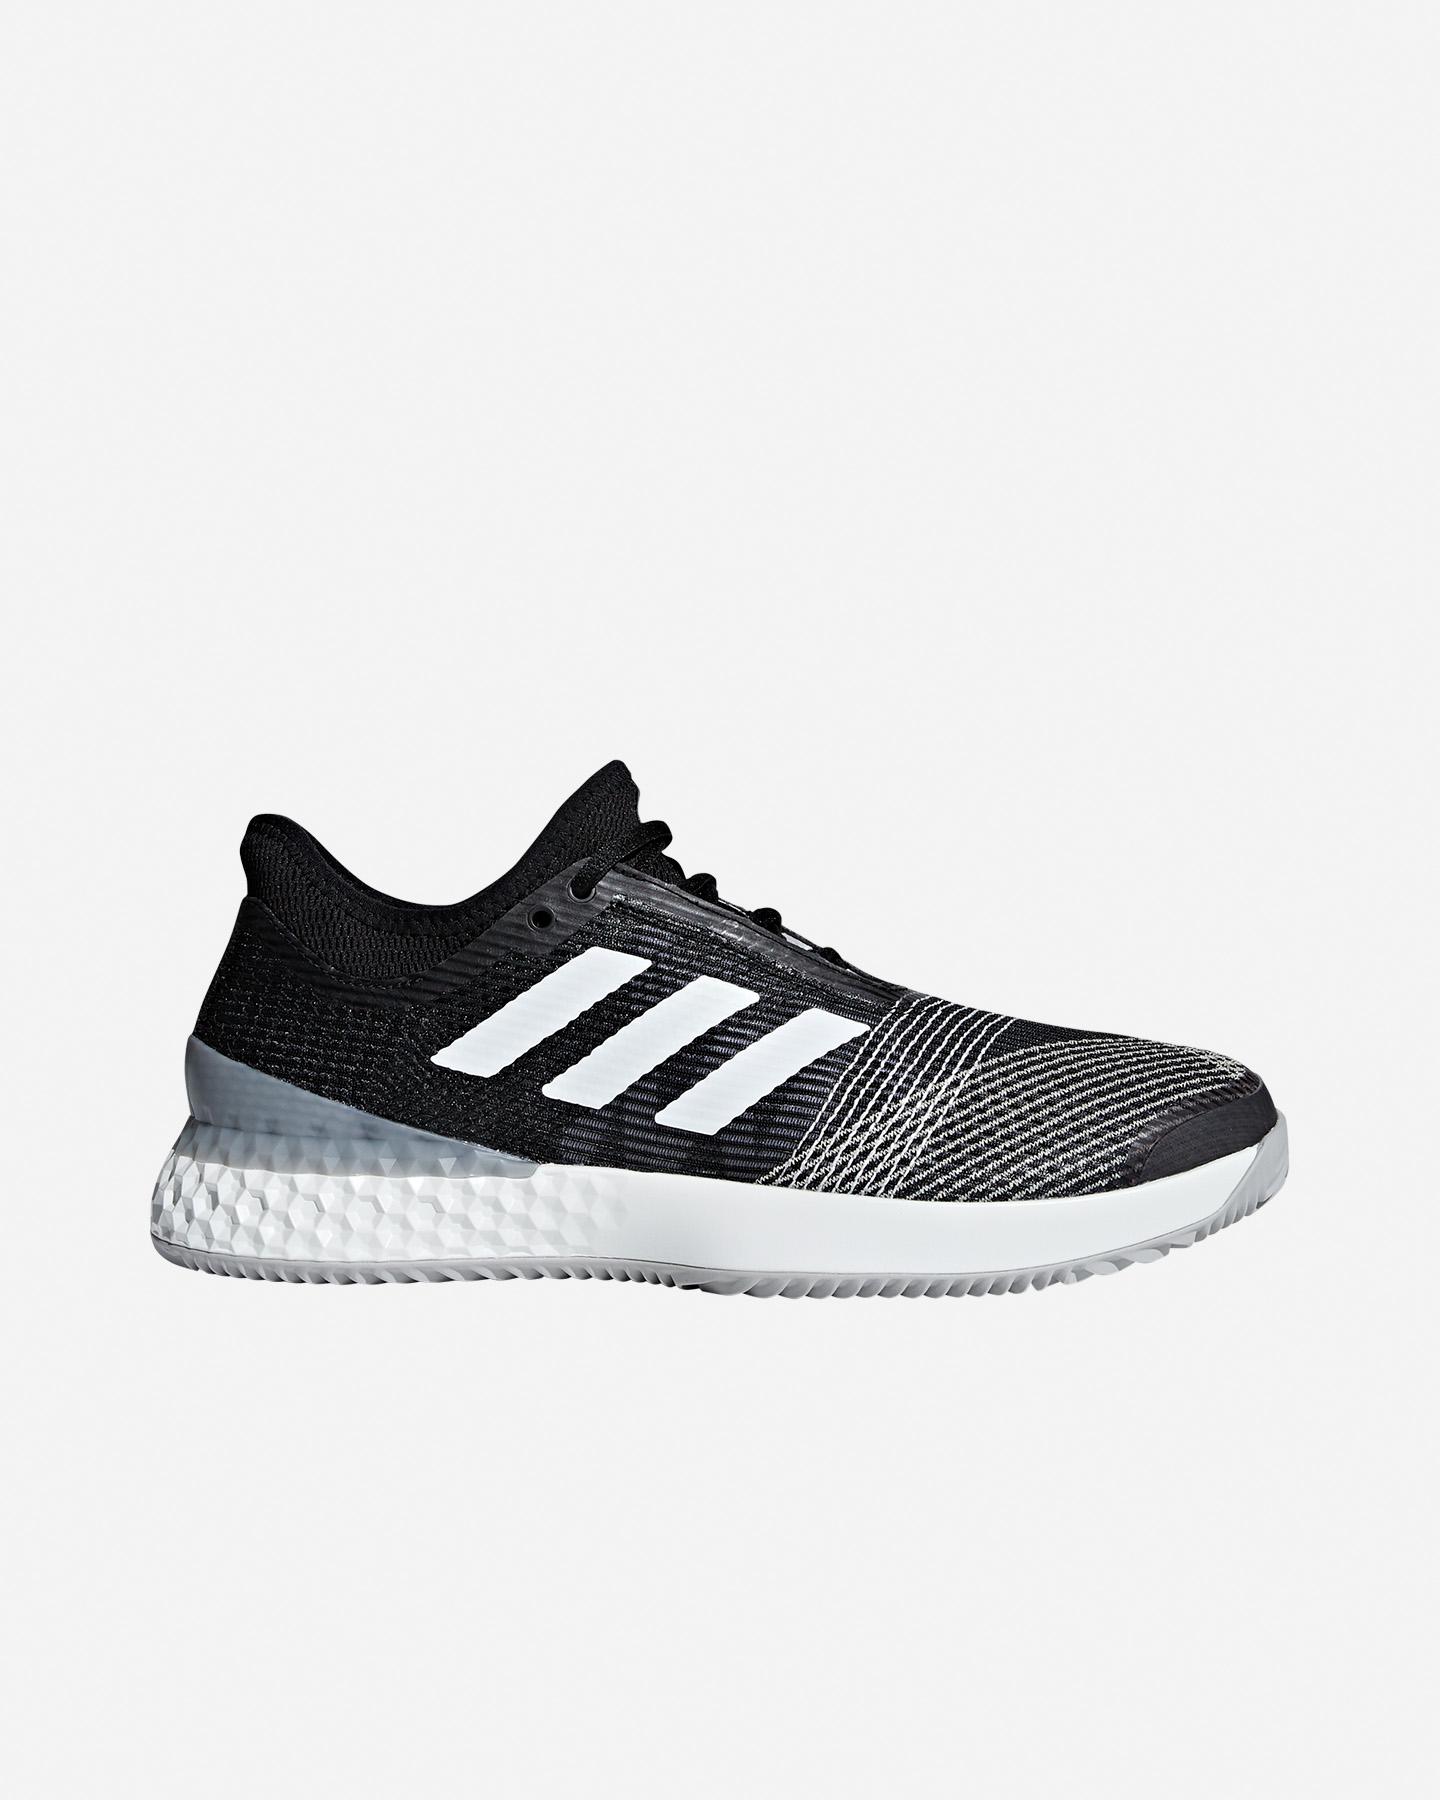 scarpe tennis adidas prezzi